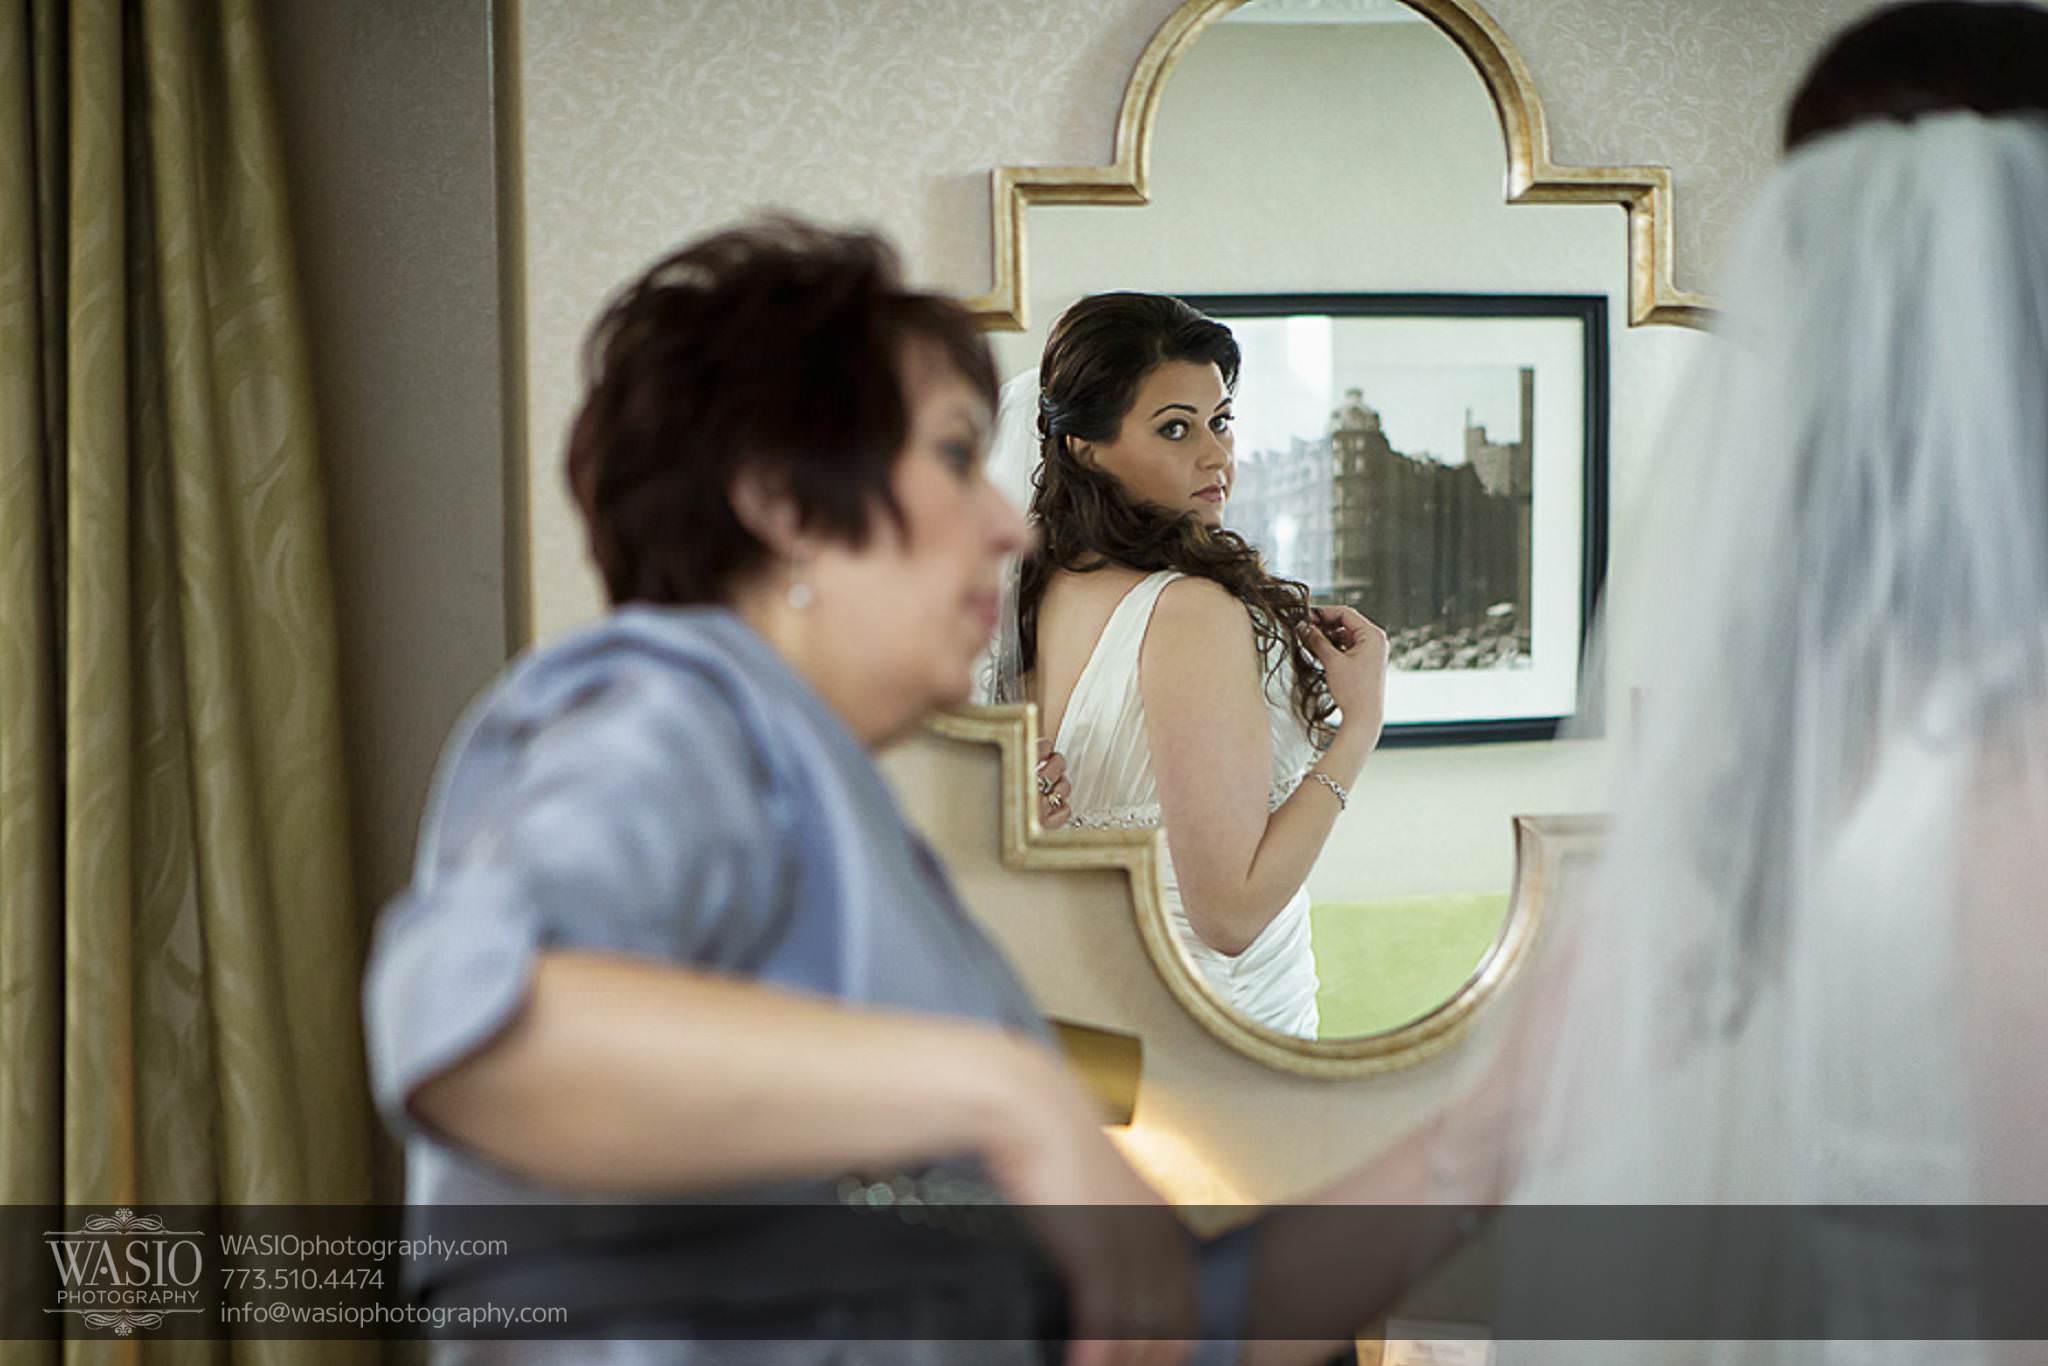 Chicago-wedding-photos-reflection-vintage-mirror-bridal-photography-047 Chicago Wedding Photos - Svetlana + Yuriy